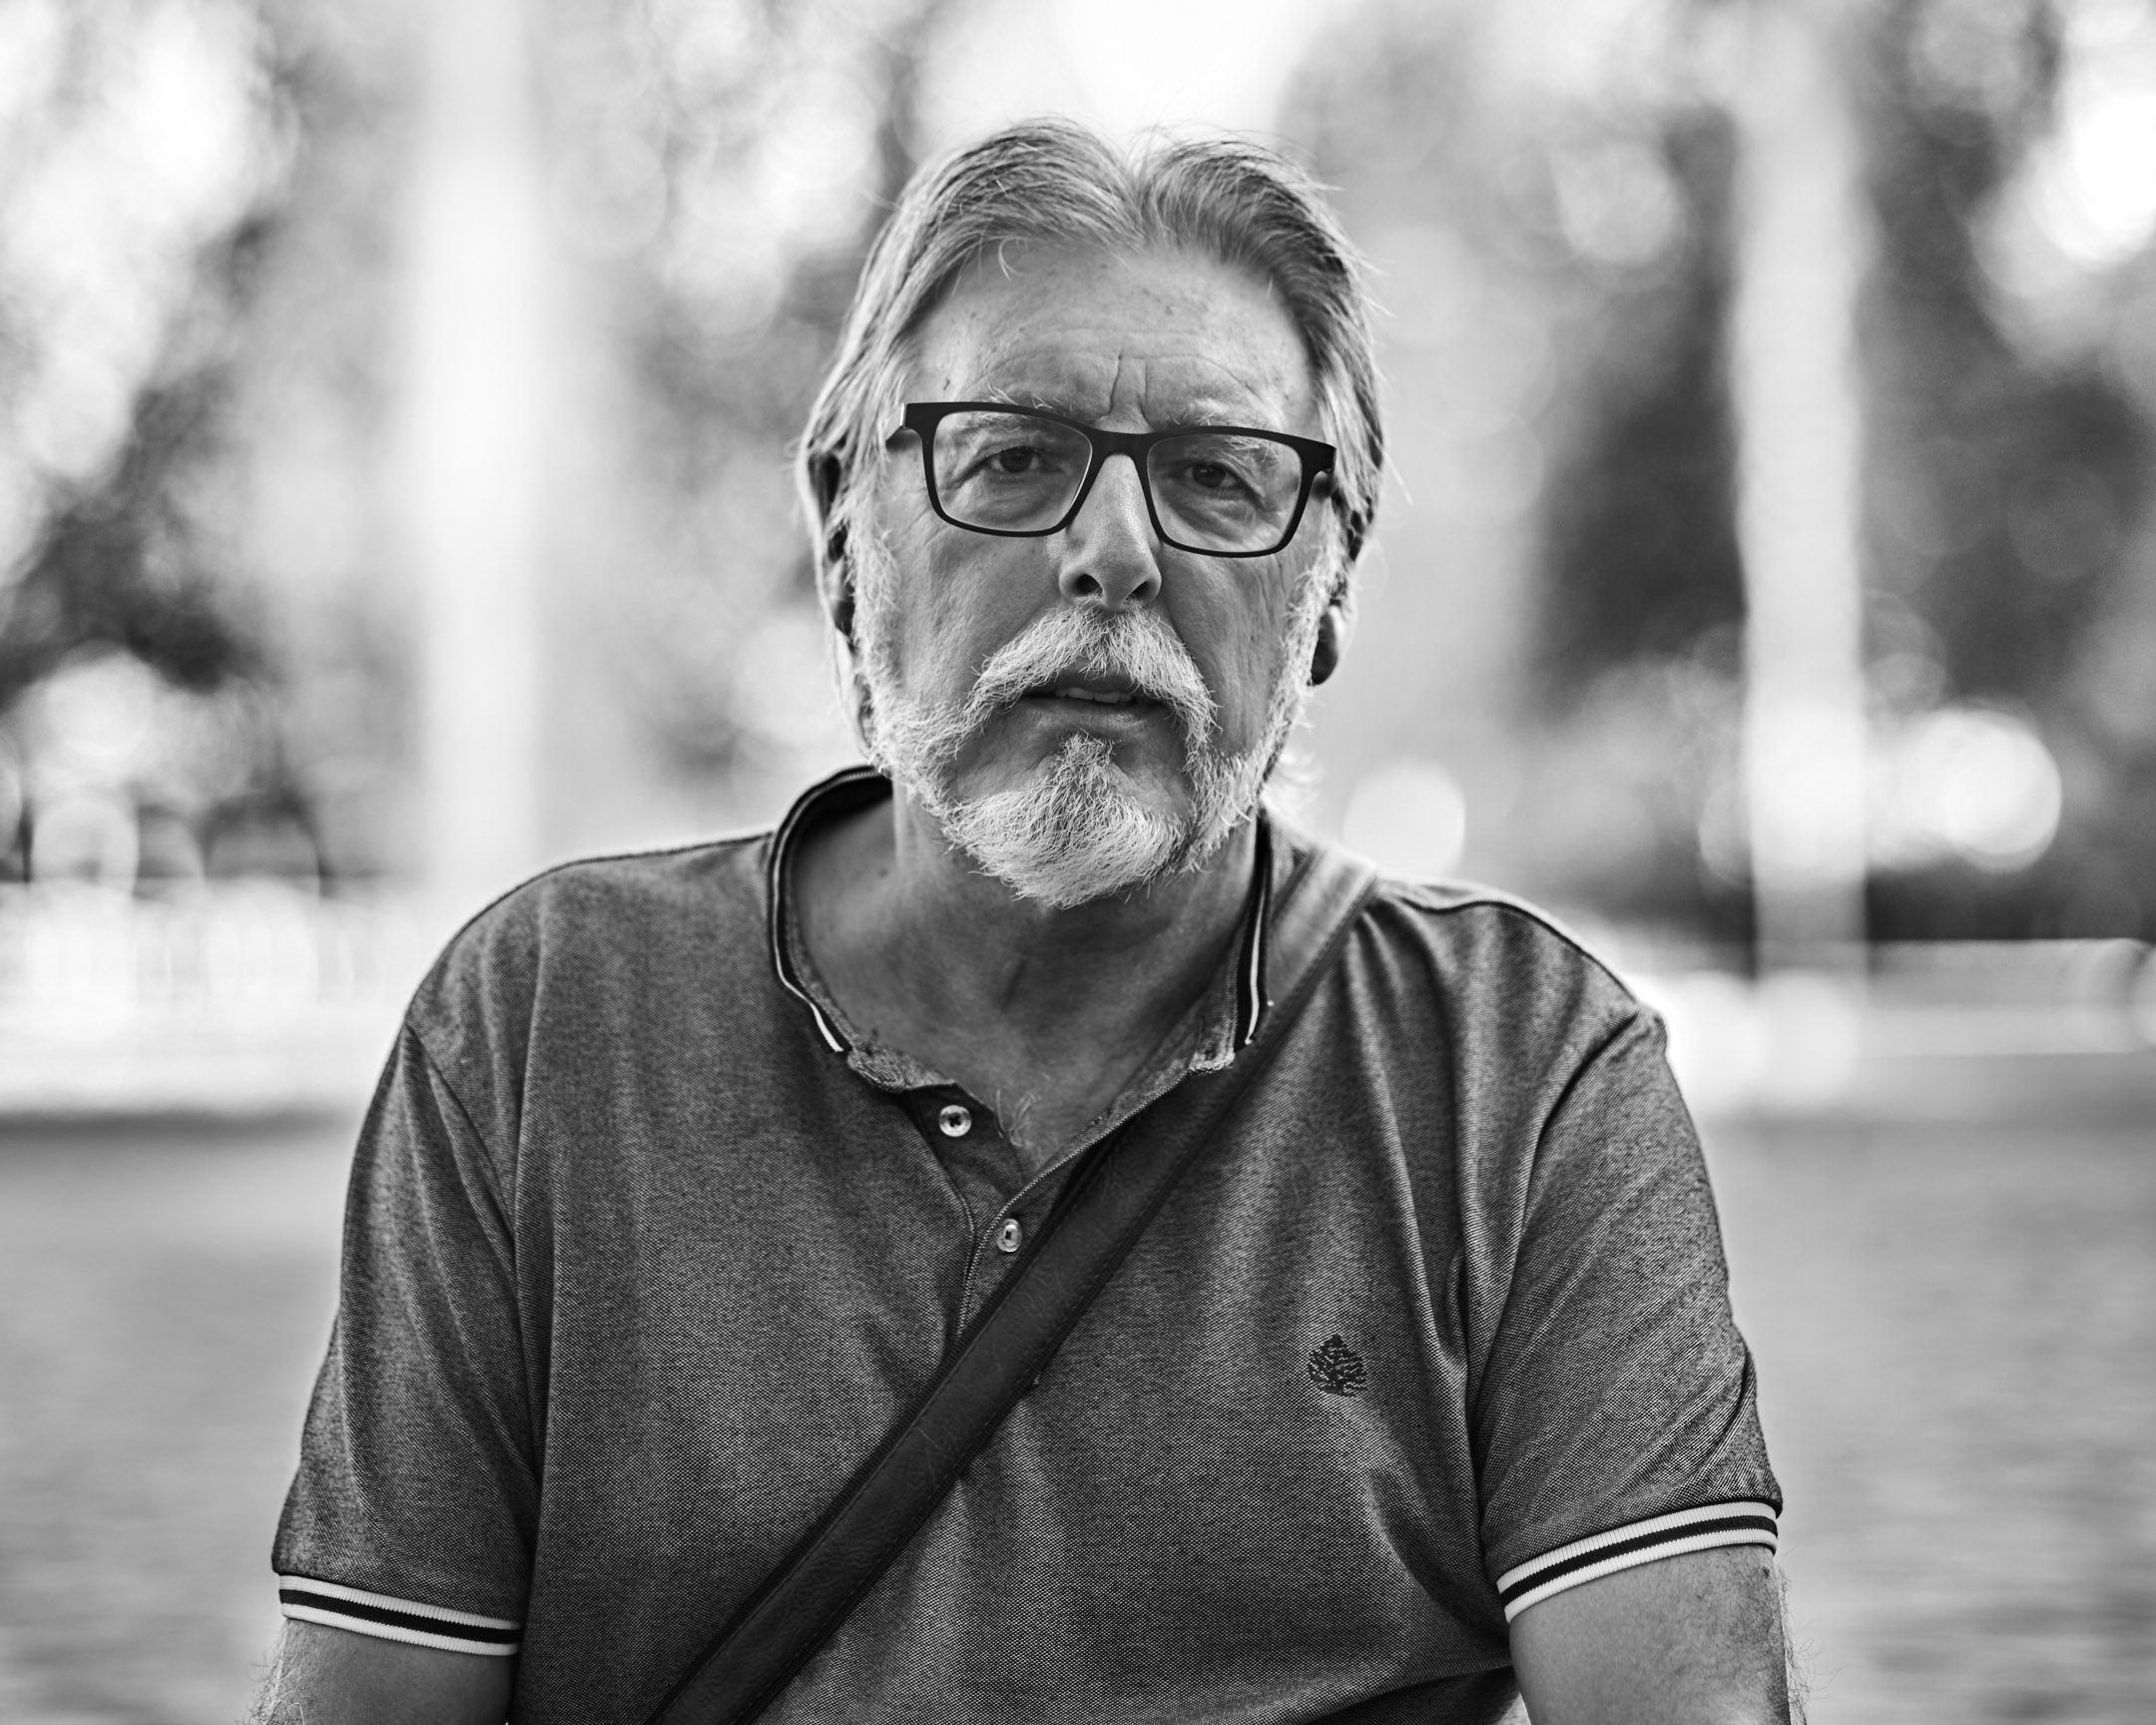 Antonio Owen Muñoz Morales ©Pepe J Galanes